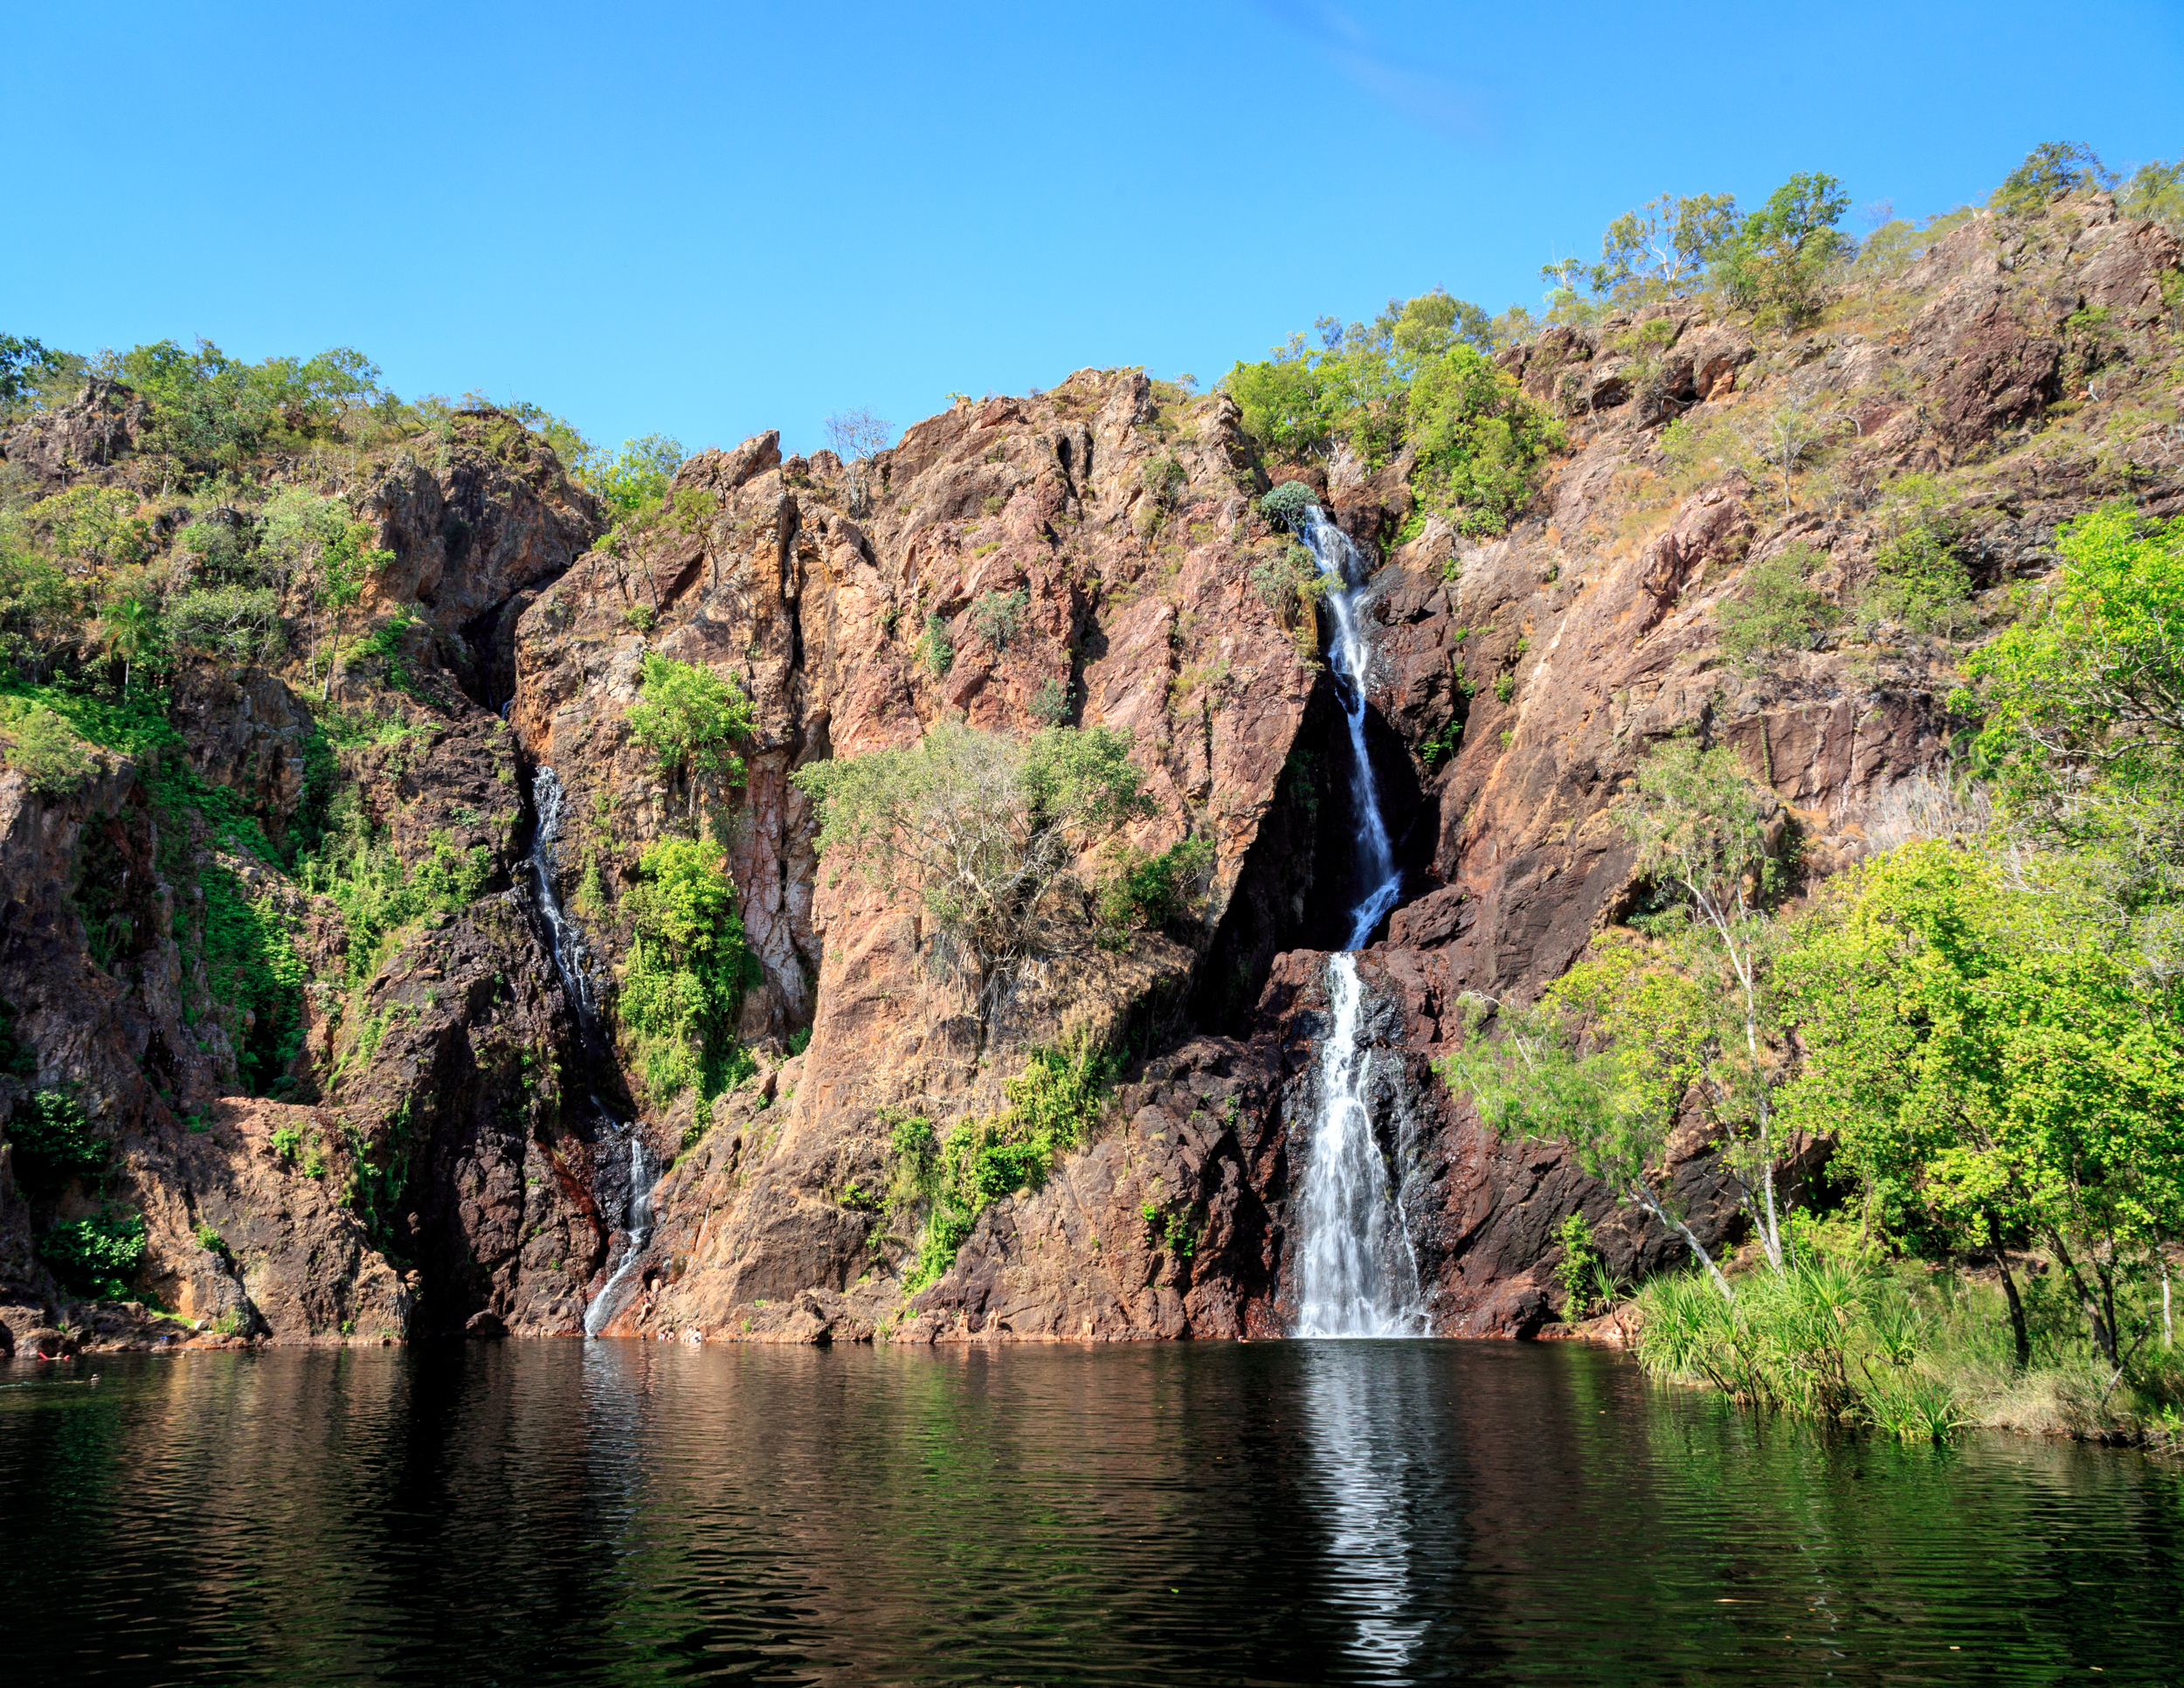 Wangi Falls in Litchfield National Park